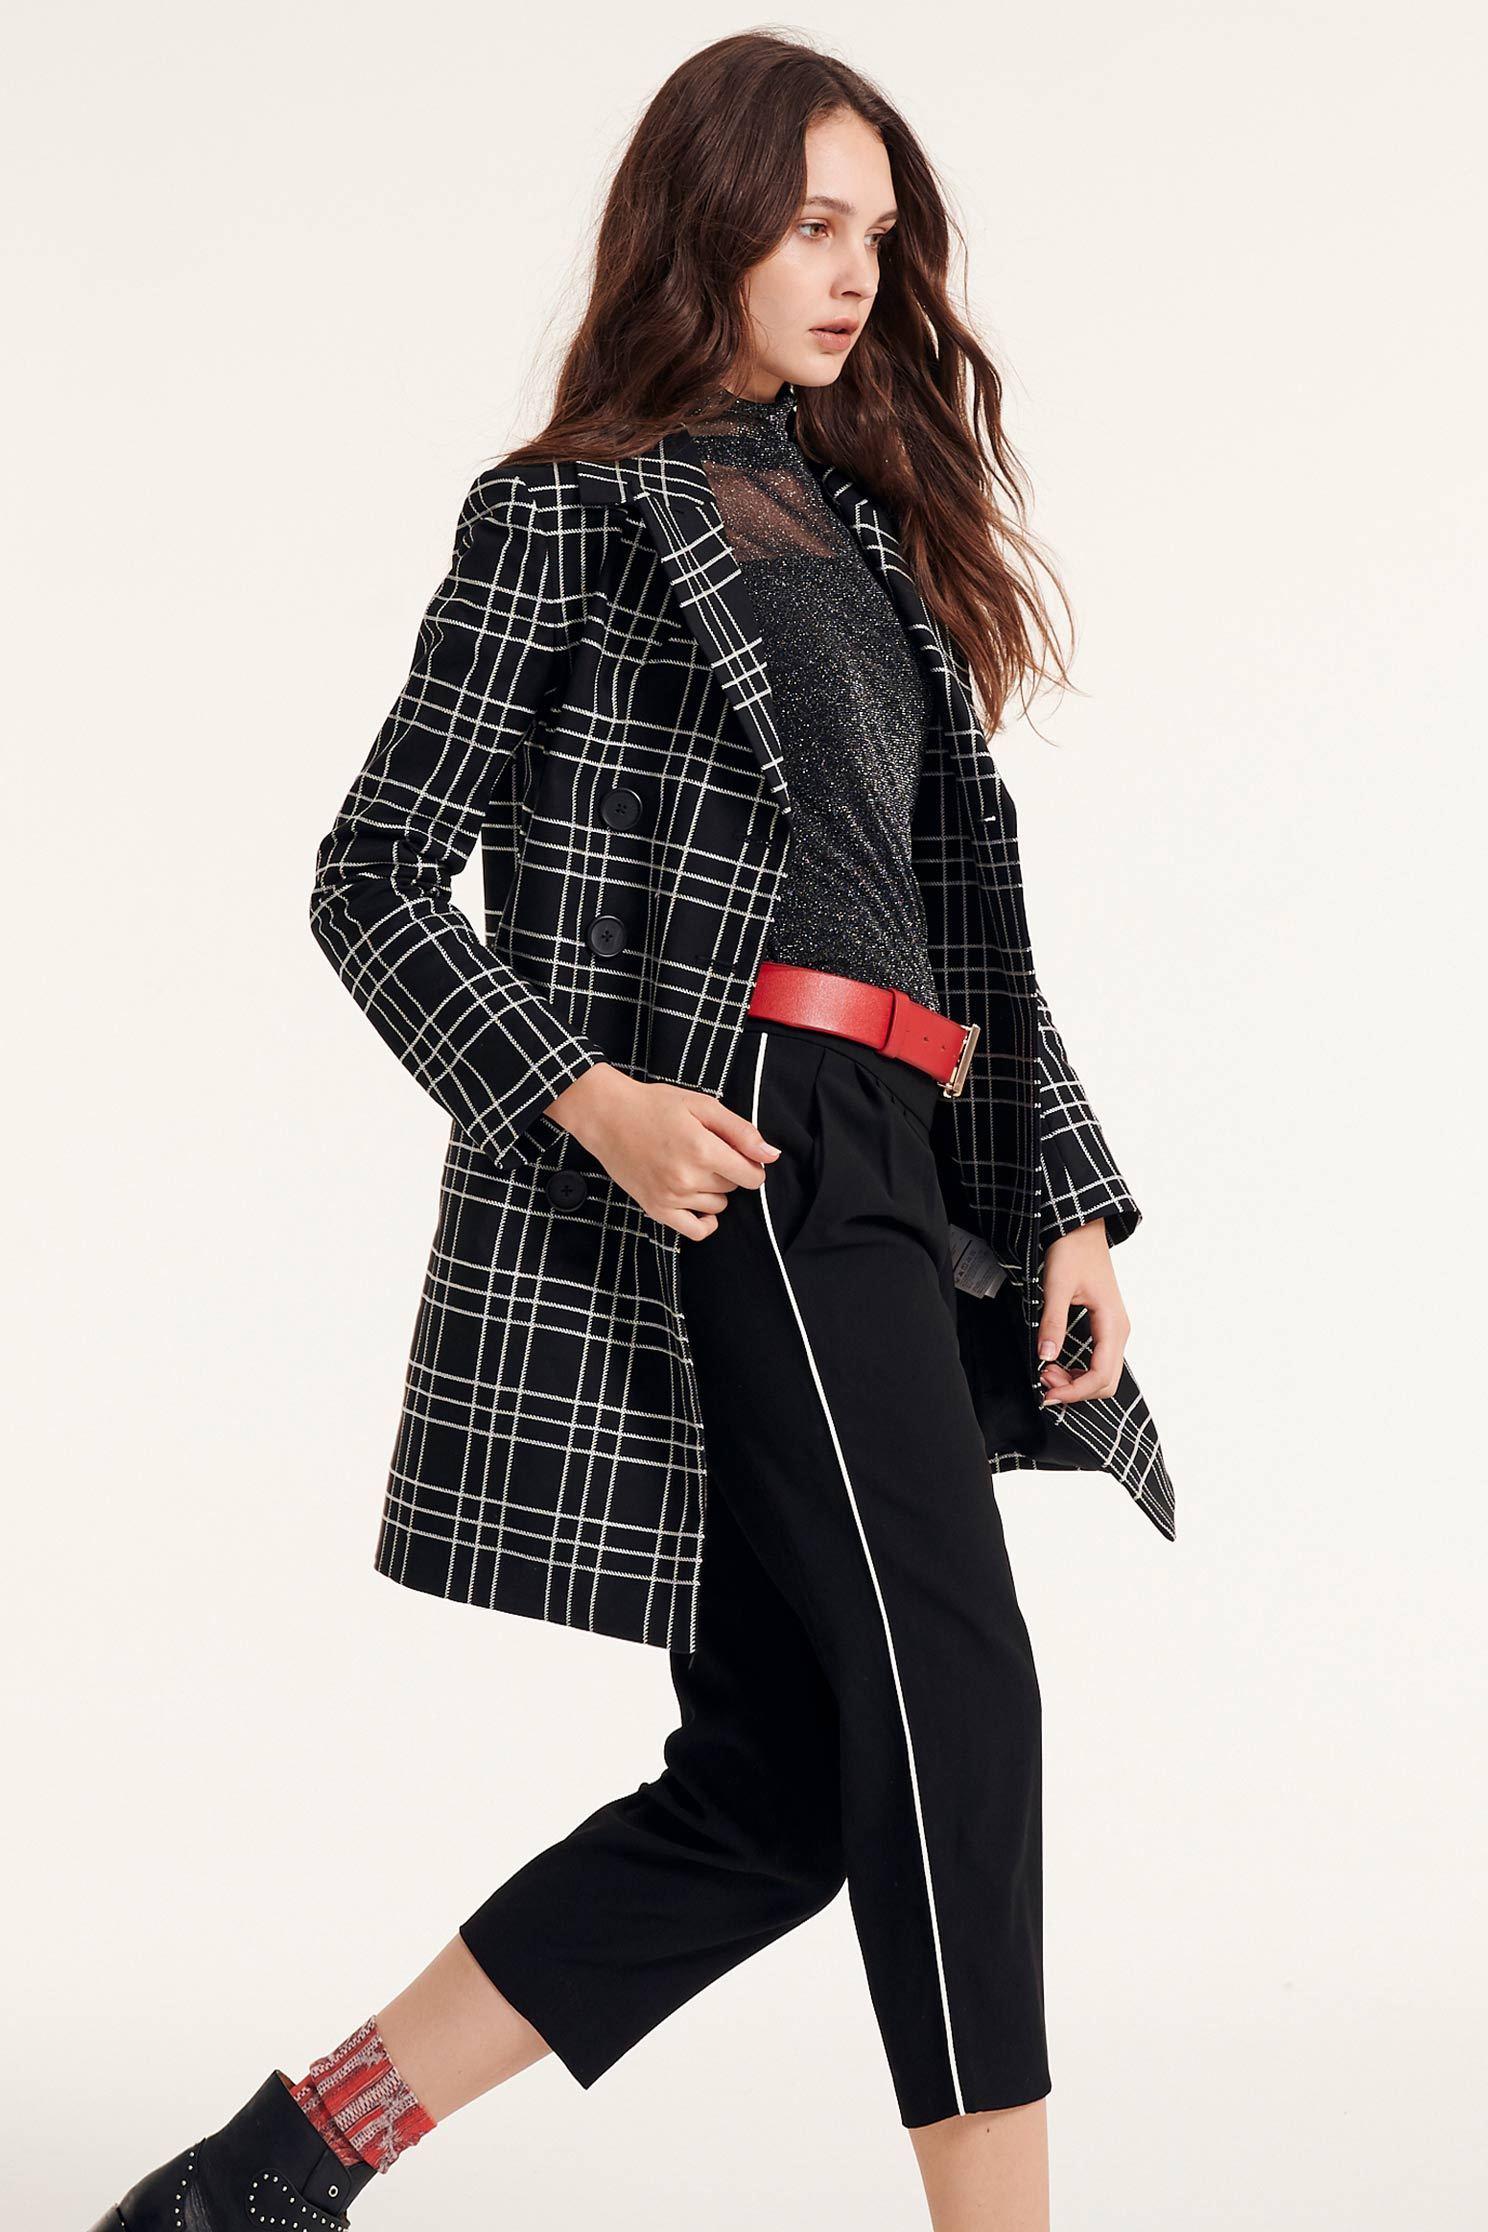 Plaid lapel coat,Embroidered,Outerwear,Season (AW) Look,Embroidered,Overcoats,Overcoats,Long sleeve outerwear,Black outerwear